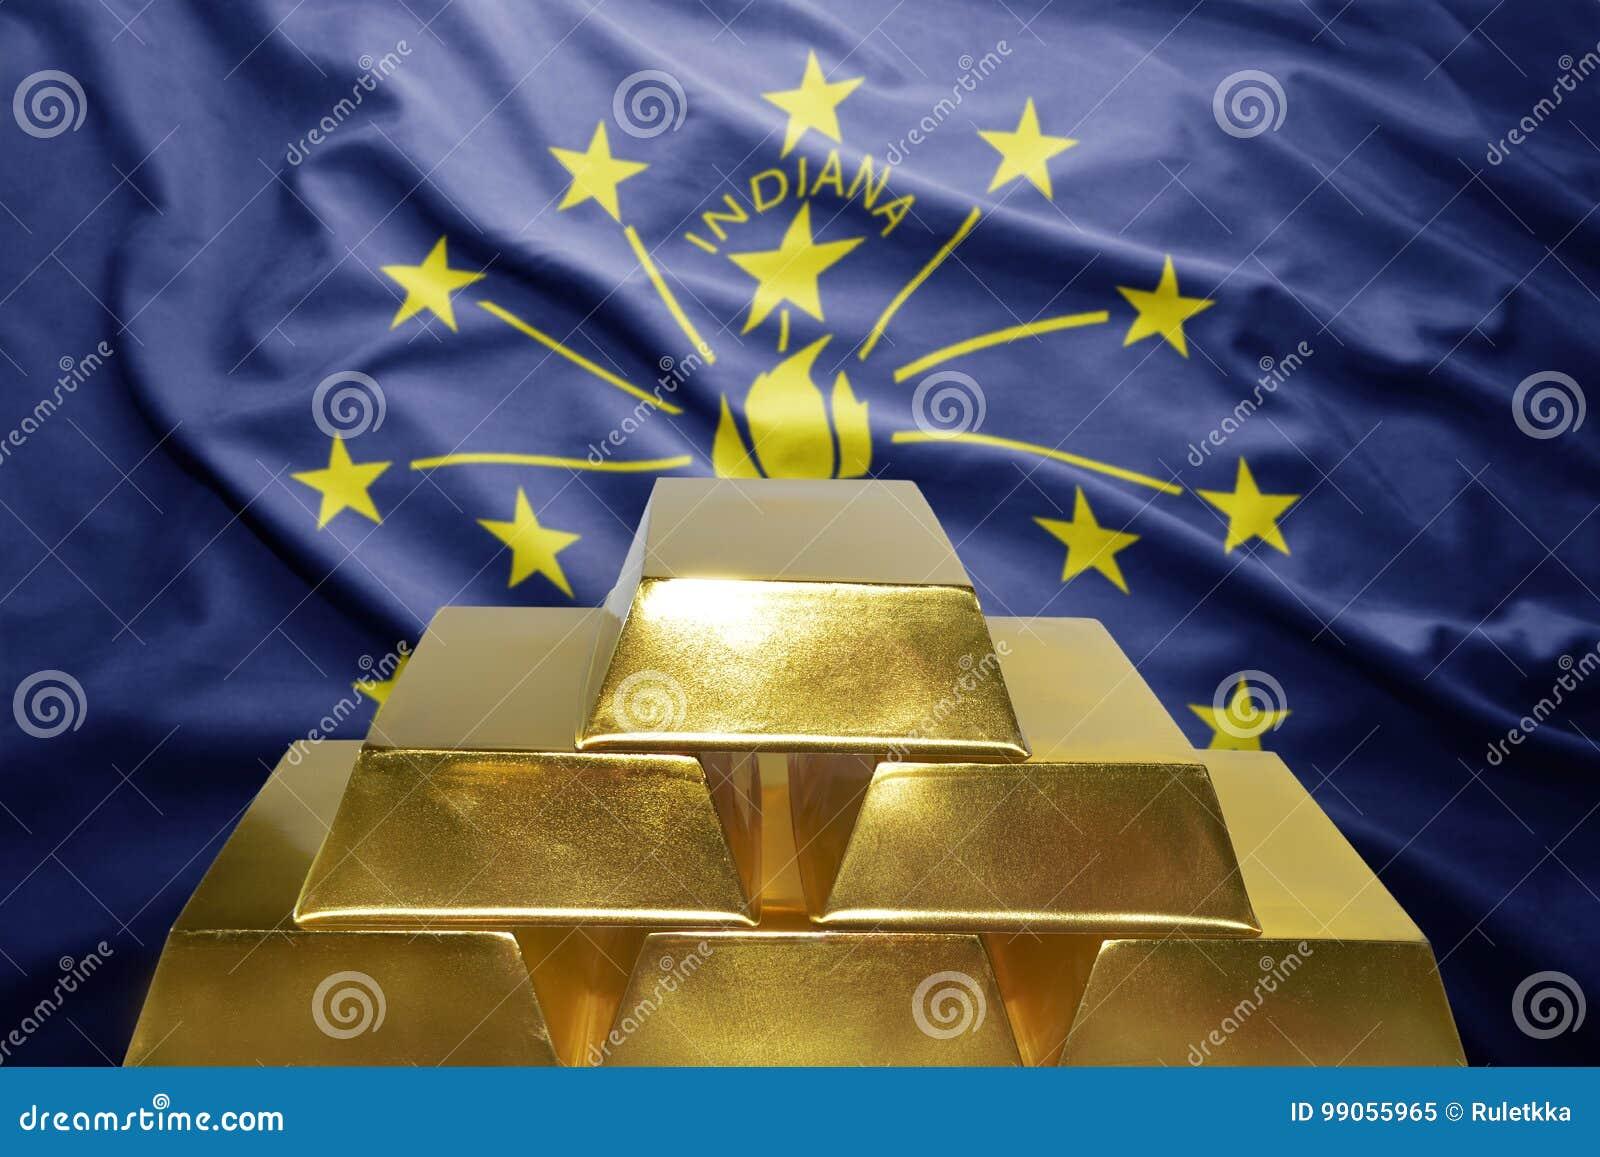 Reservas de oro de Indiana